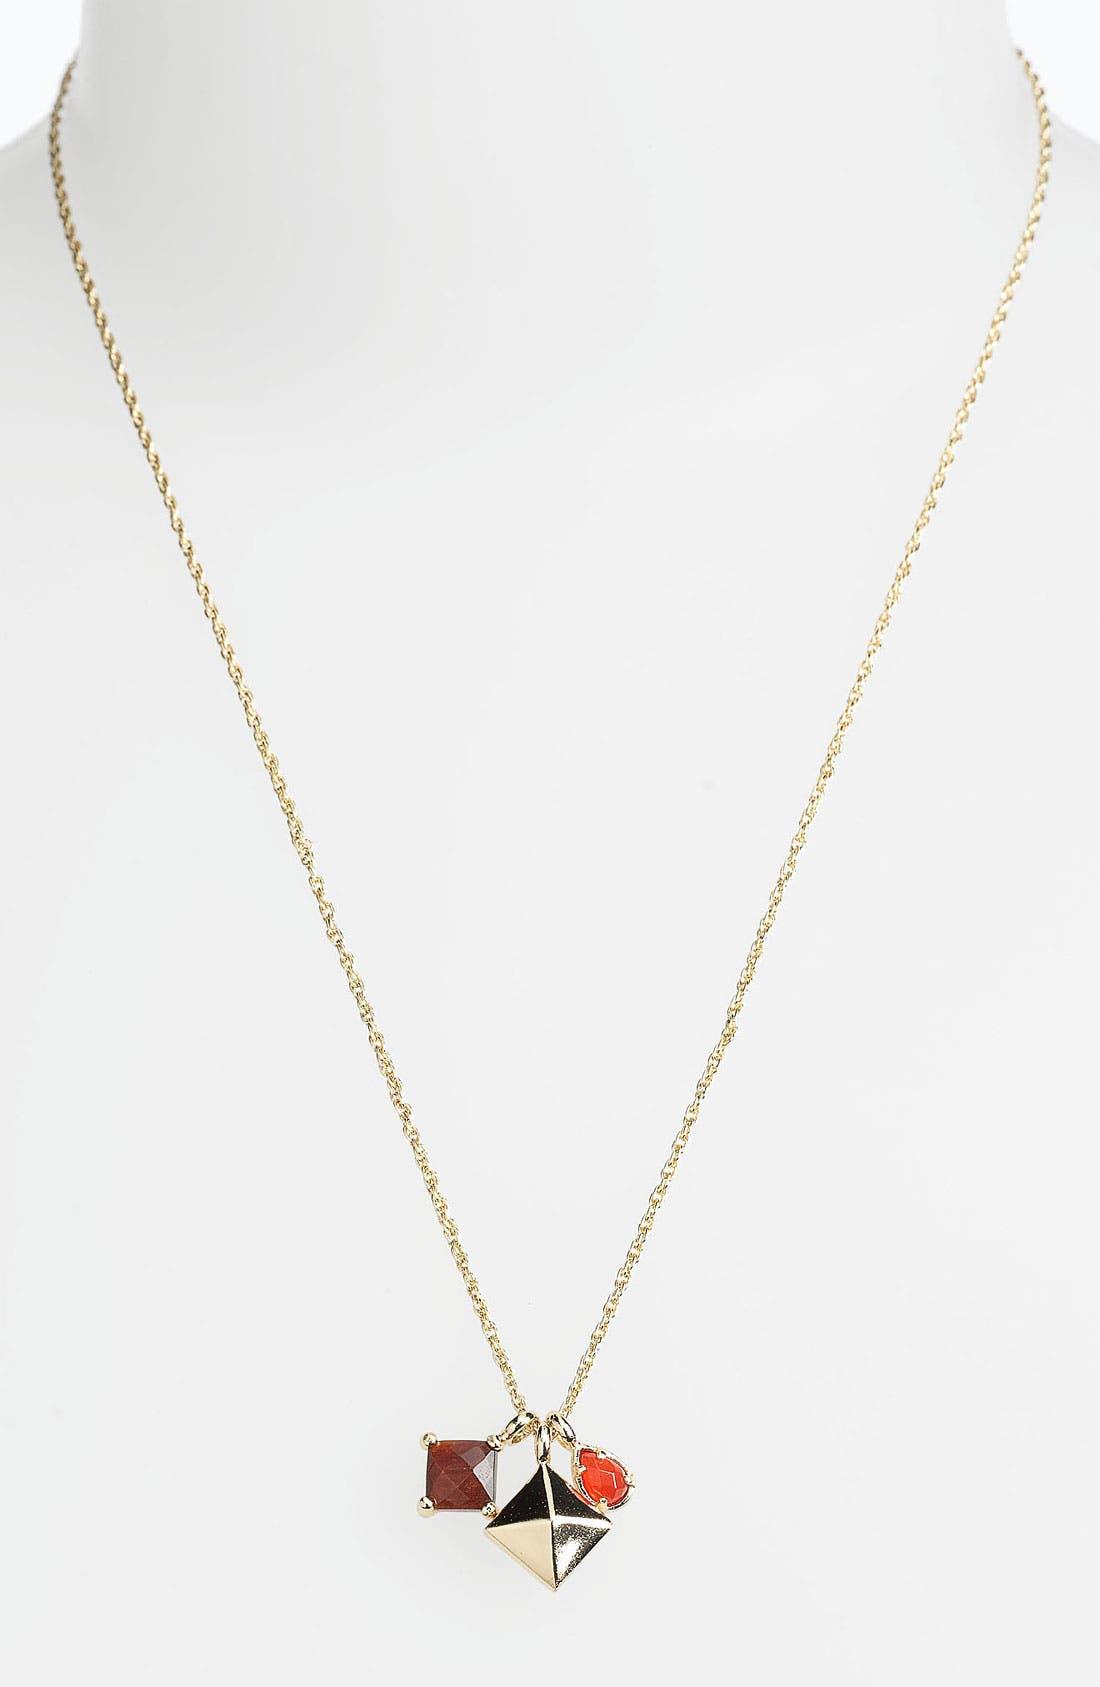 Main Image - Kendra Scott 'Sira' Pendant Necklace